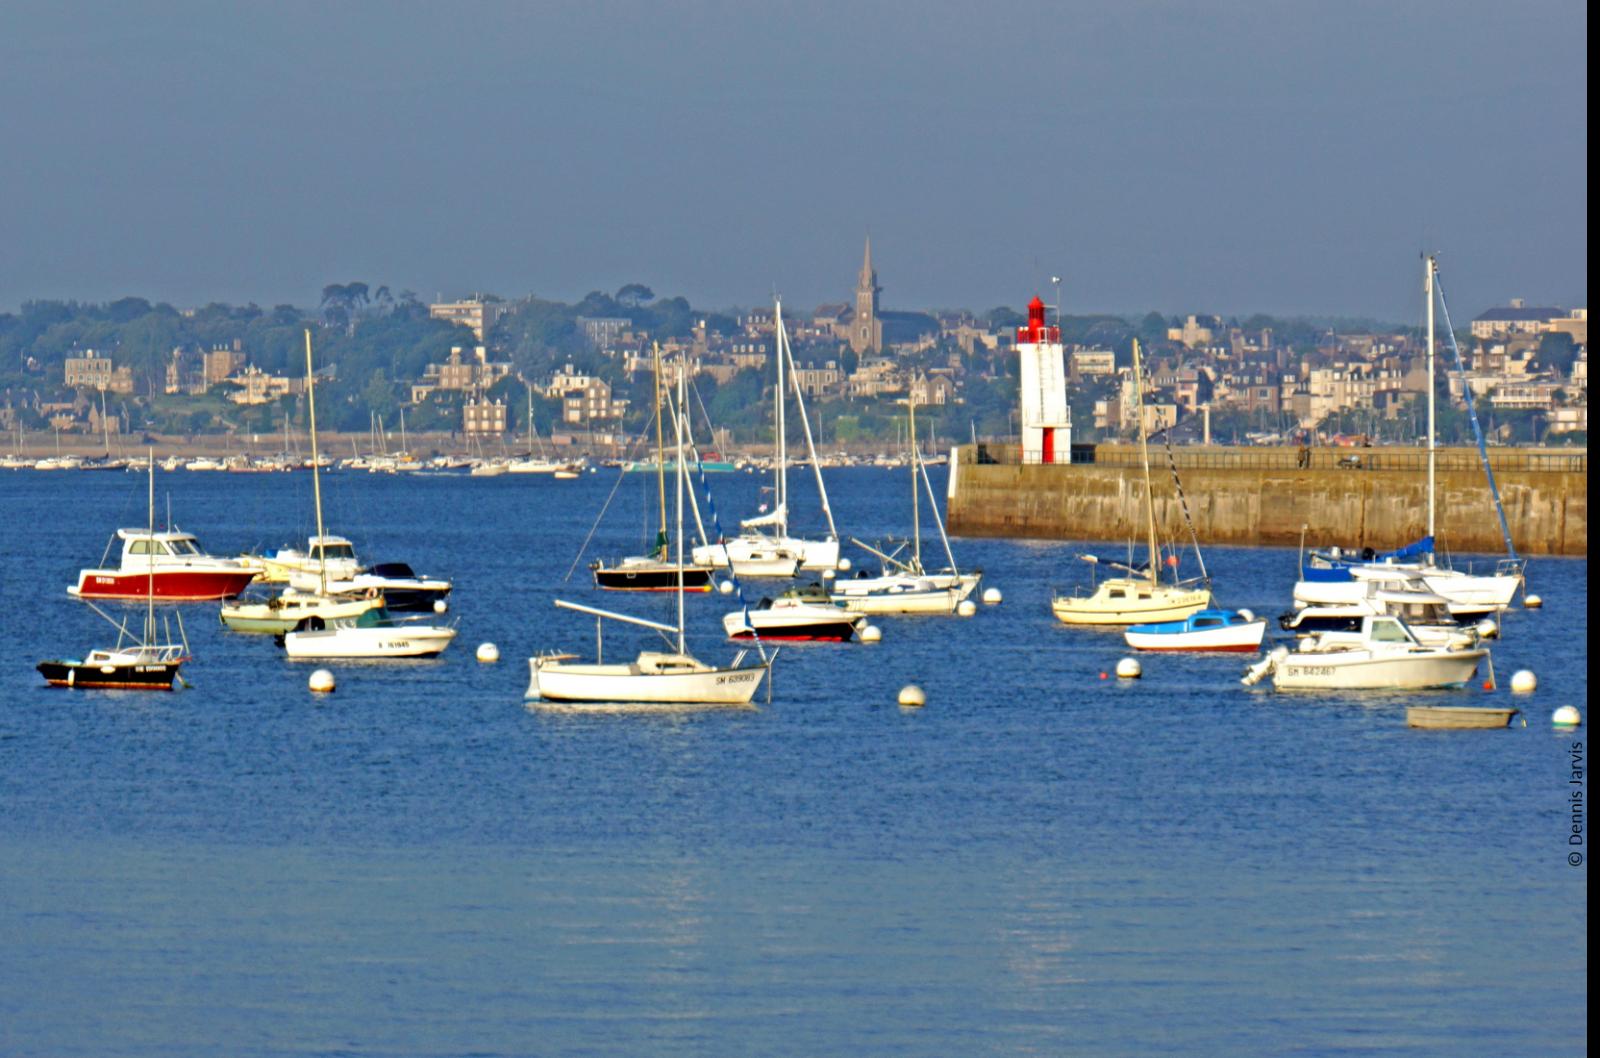 St Malo week end en bretagne amoureux